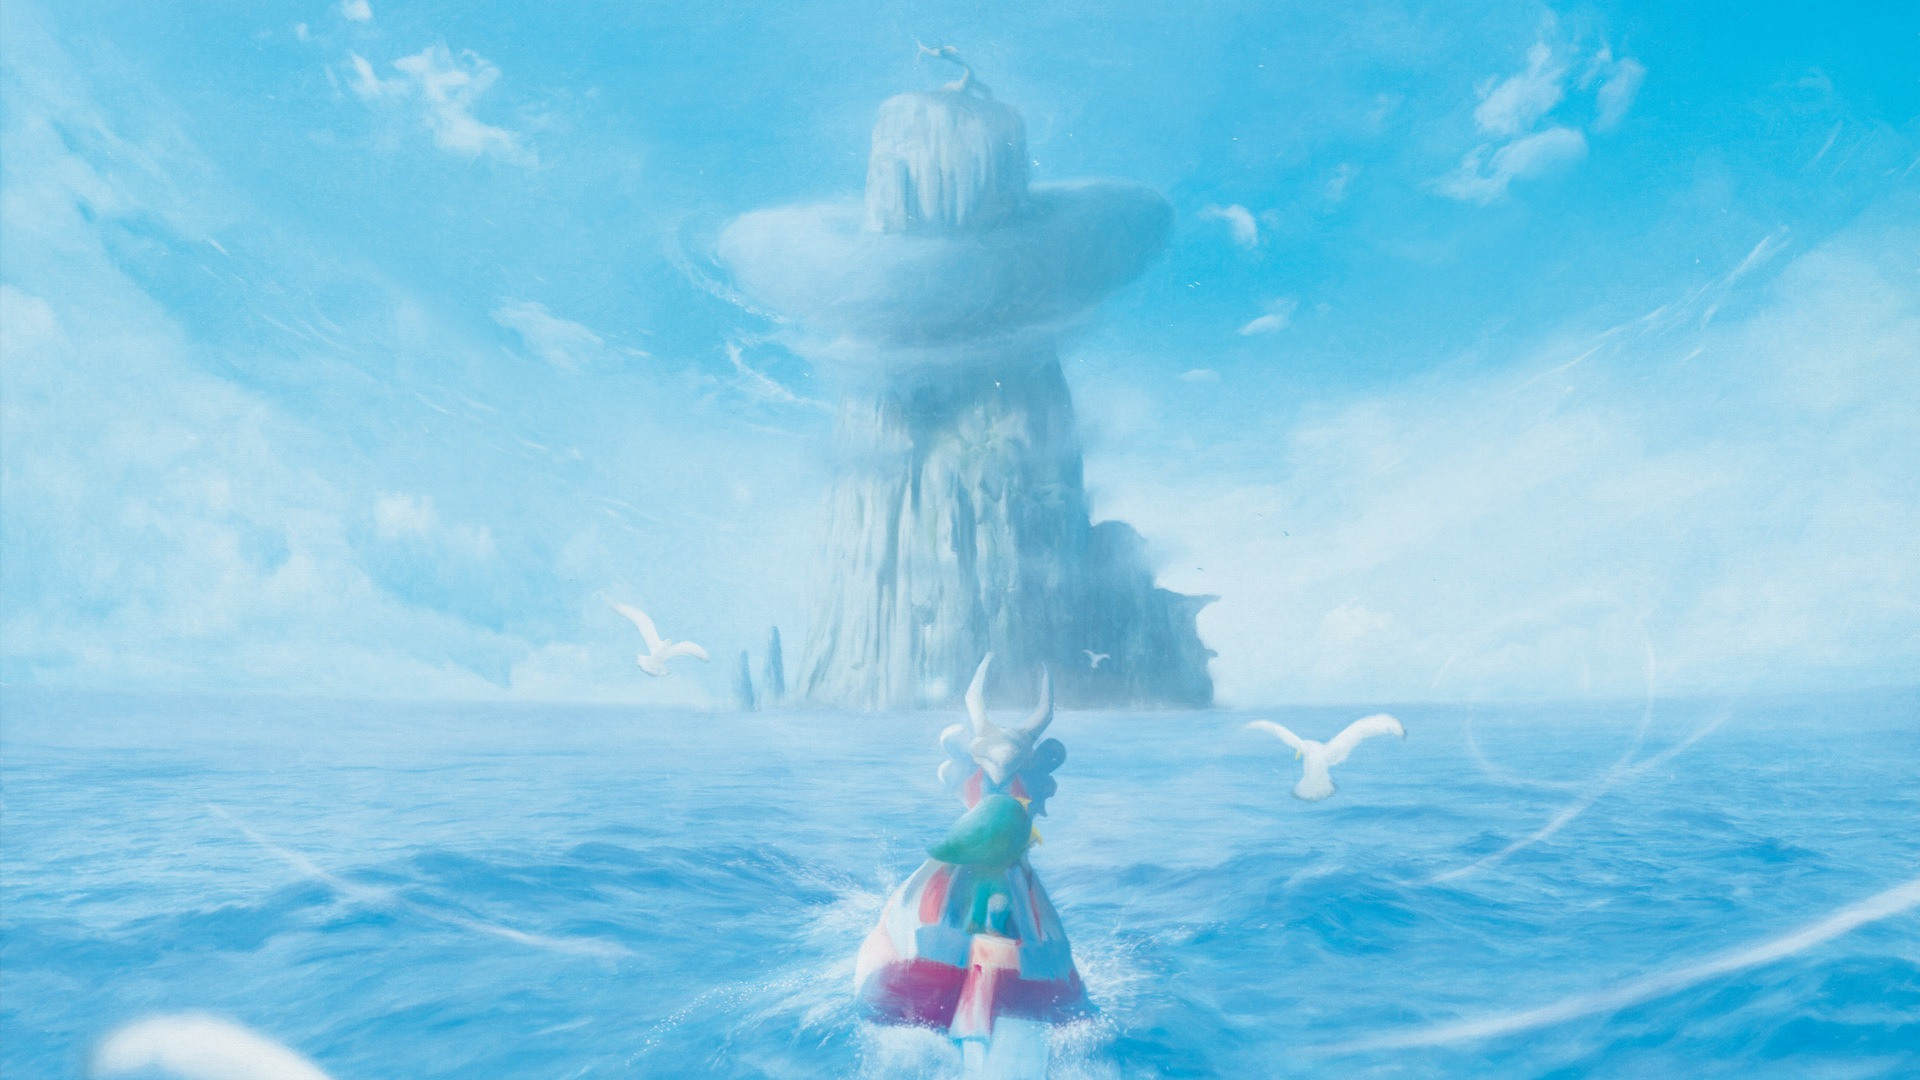 The Legend Of Zelda The Wind Waker Hd Wallpaper Background